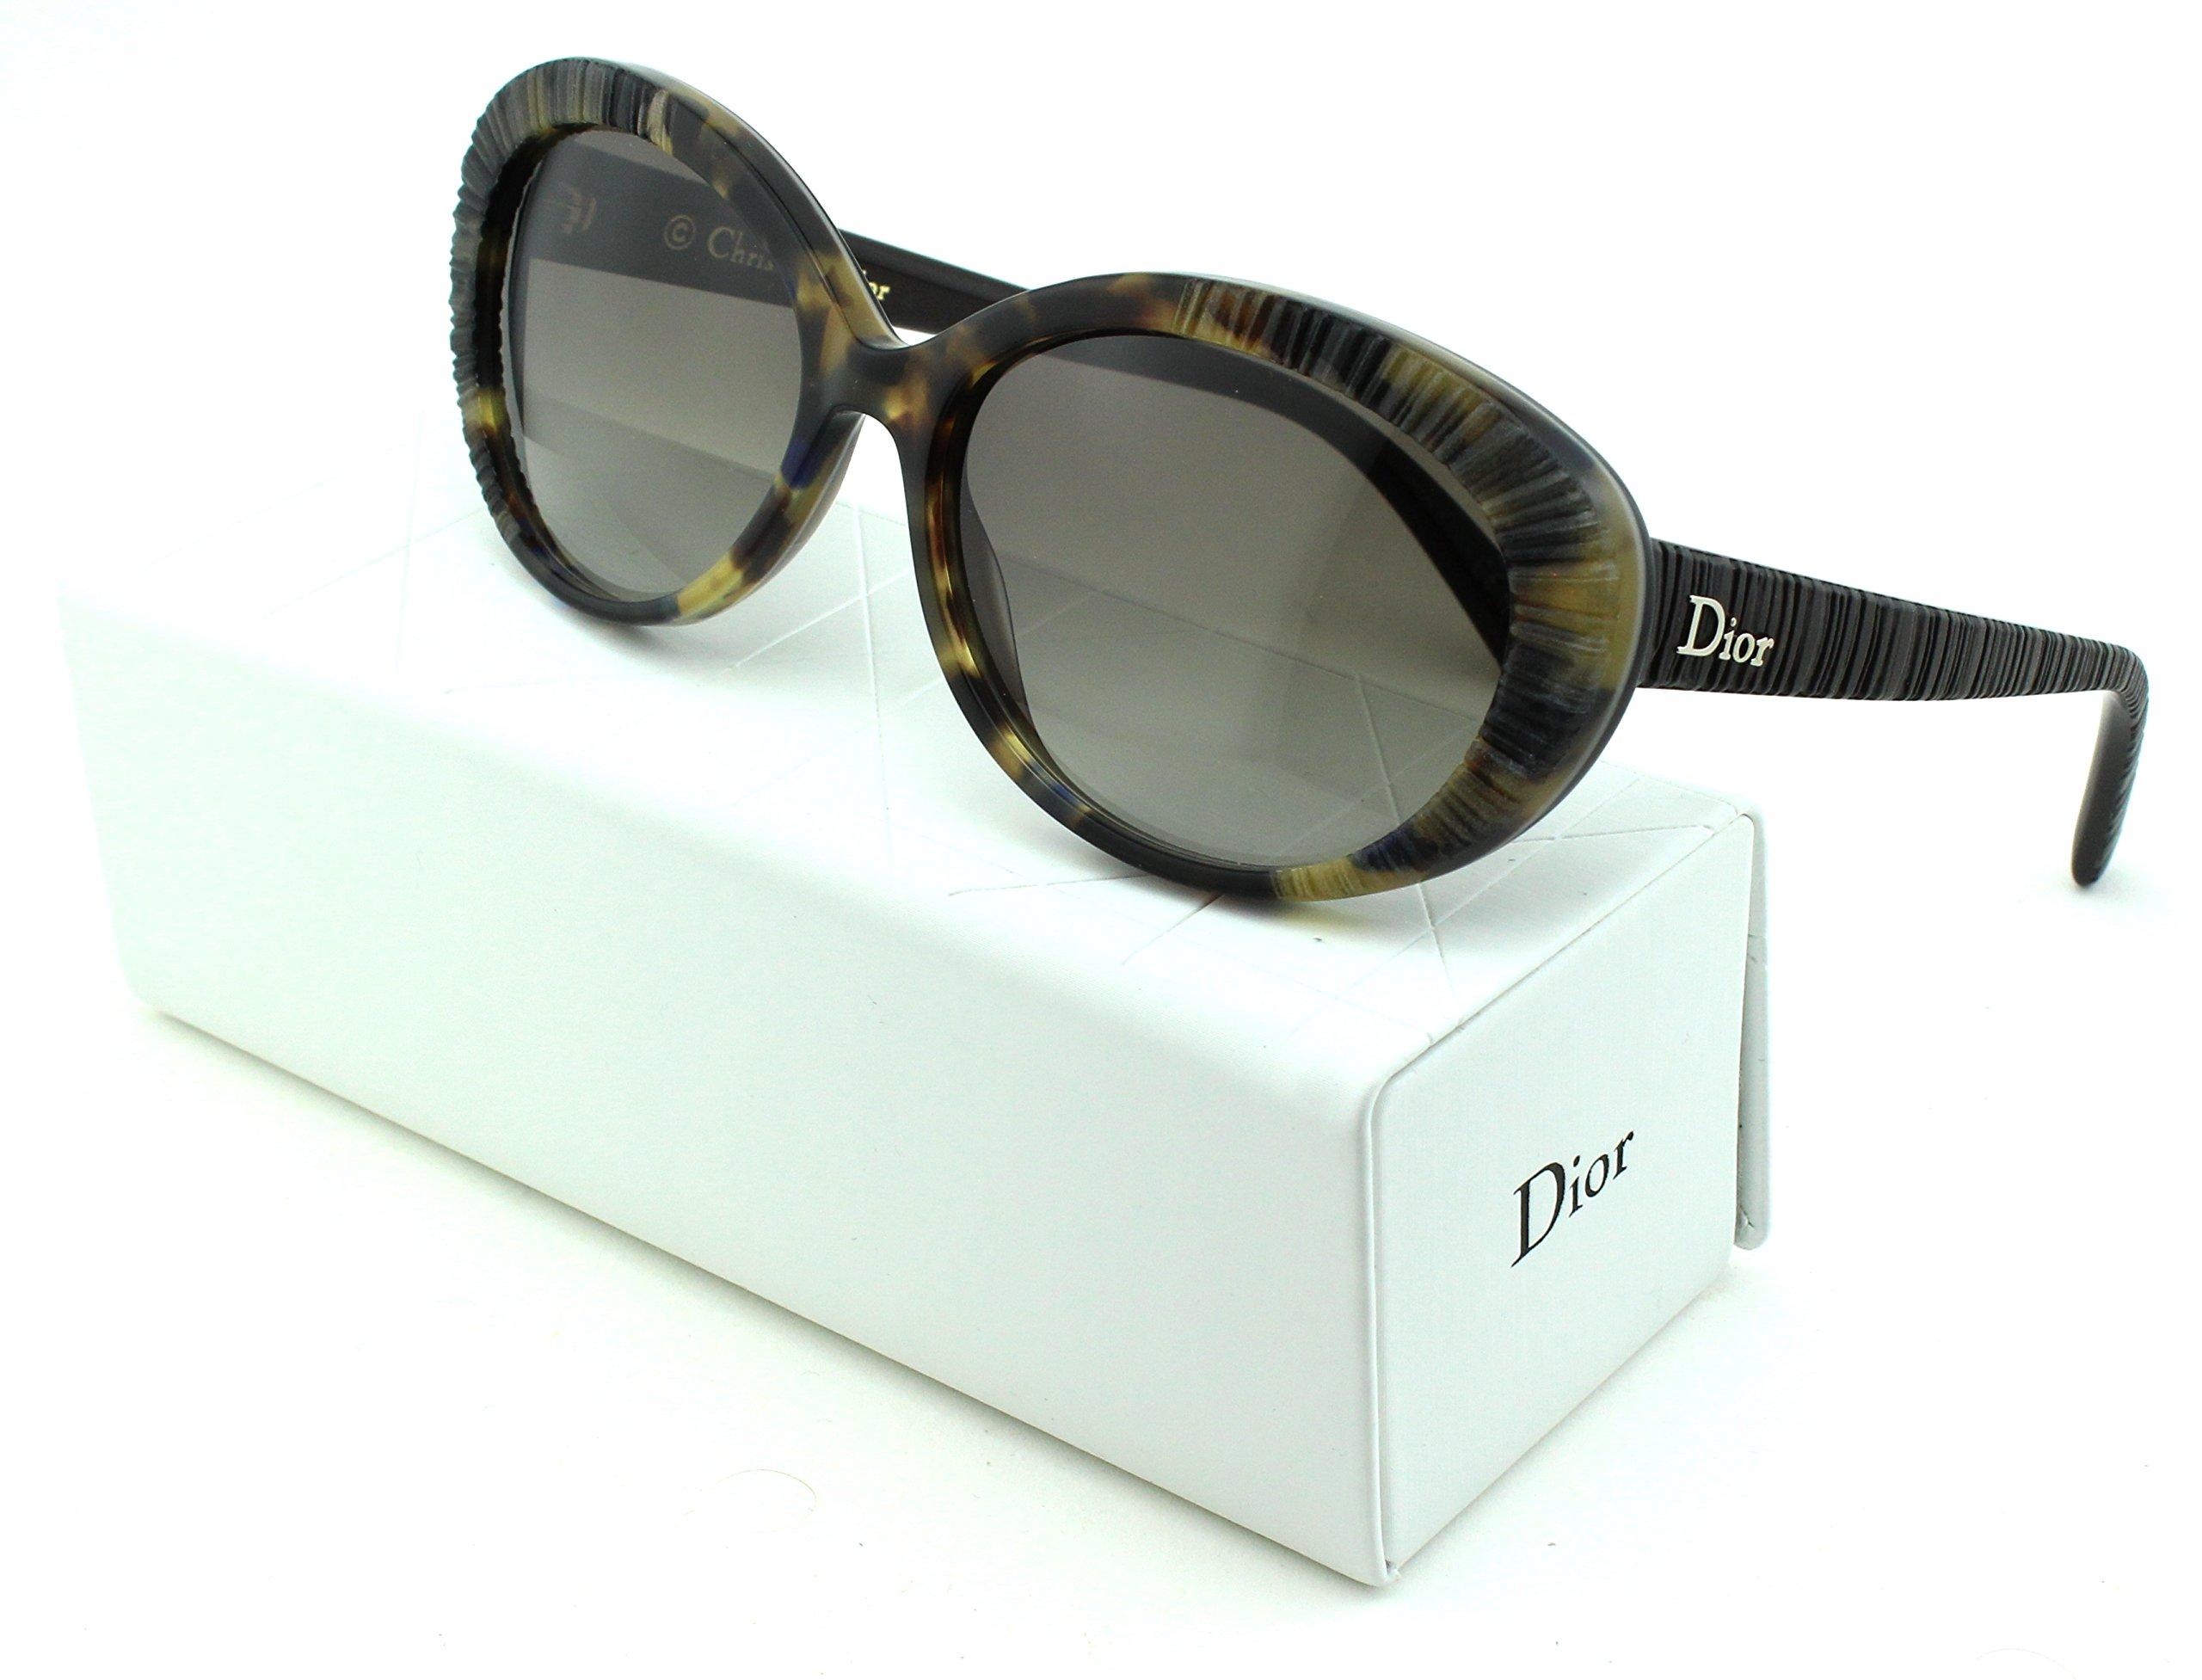 Dior Taffetas 3 Cateye Women Sunglasses (Havana Brown Frame, Brown Gradient Lens (02FW)) by Dior